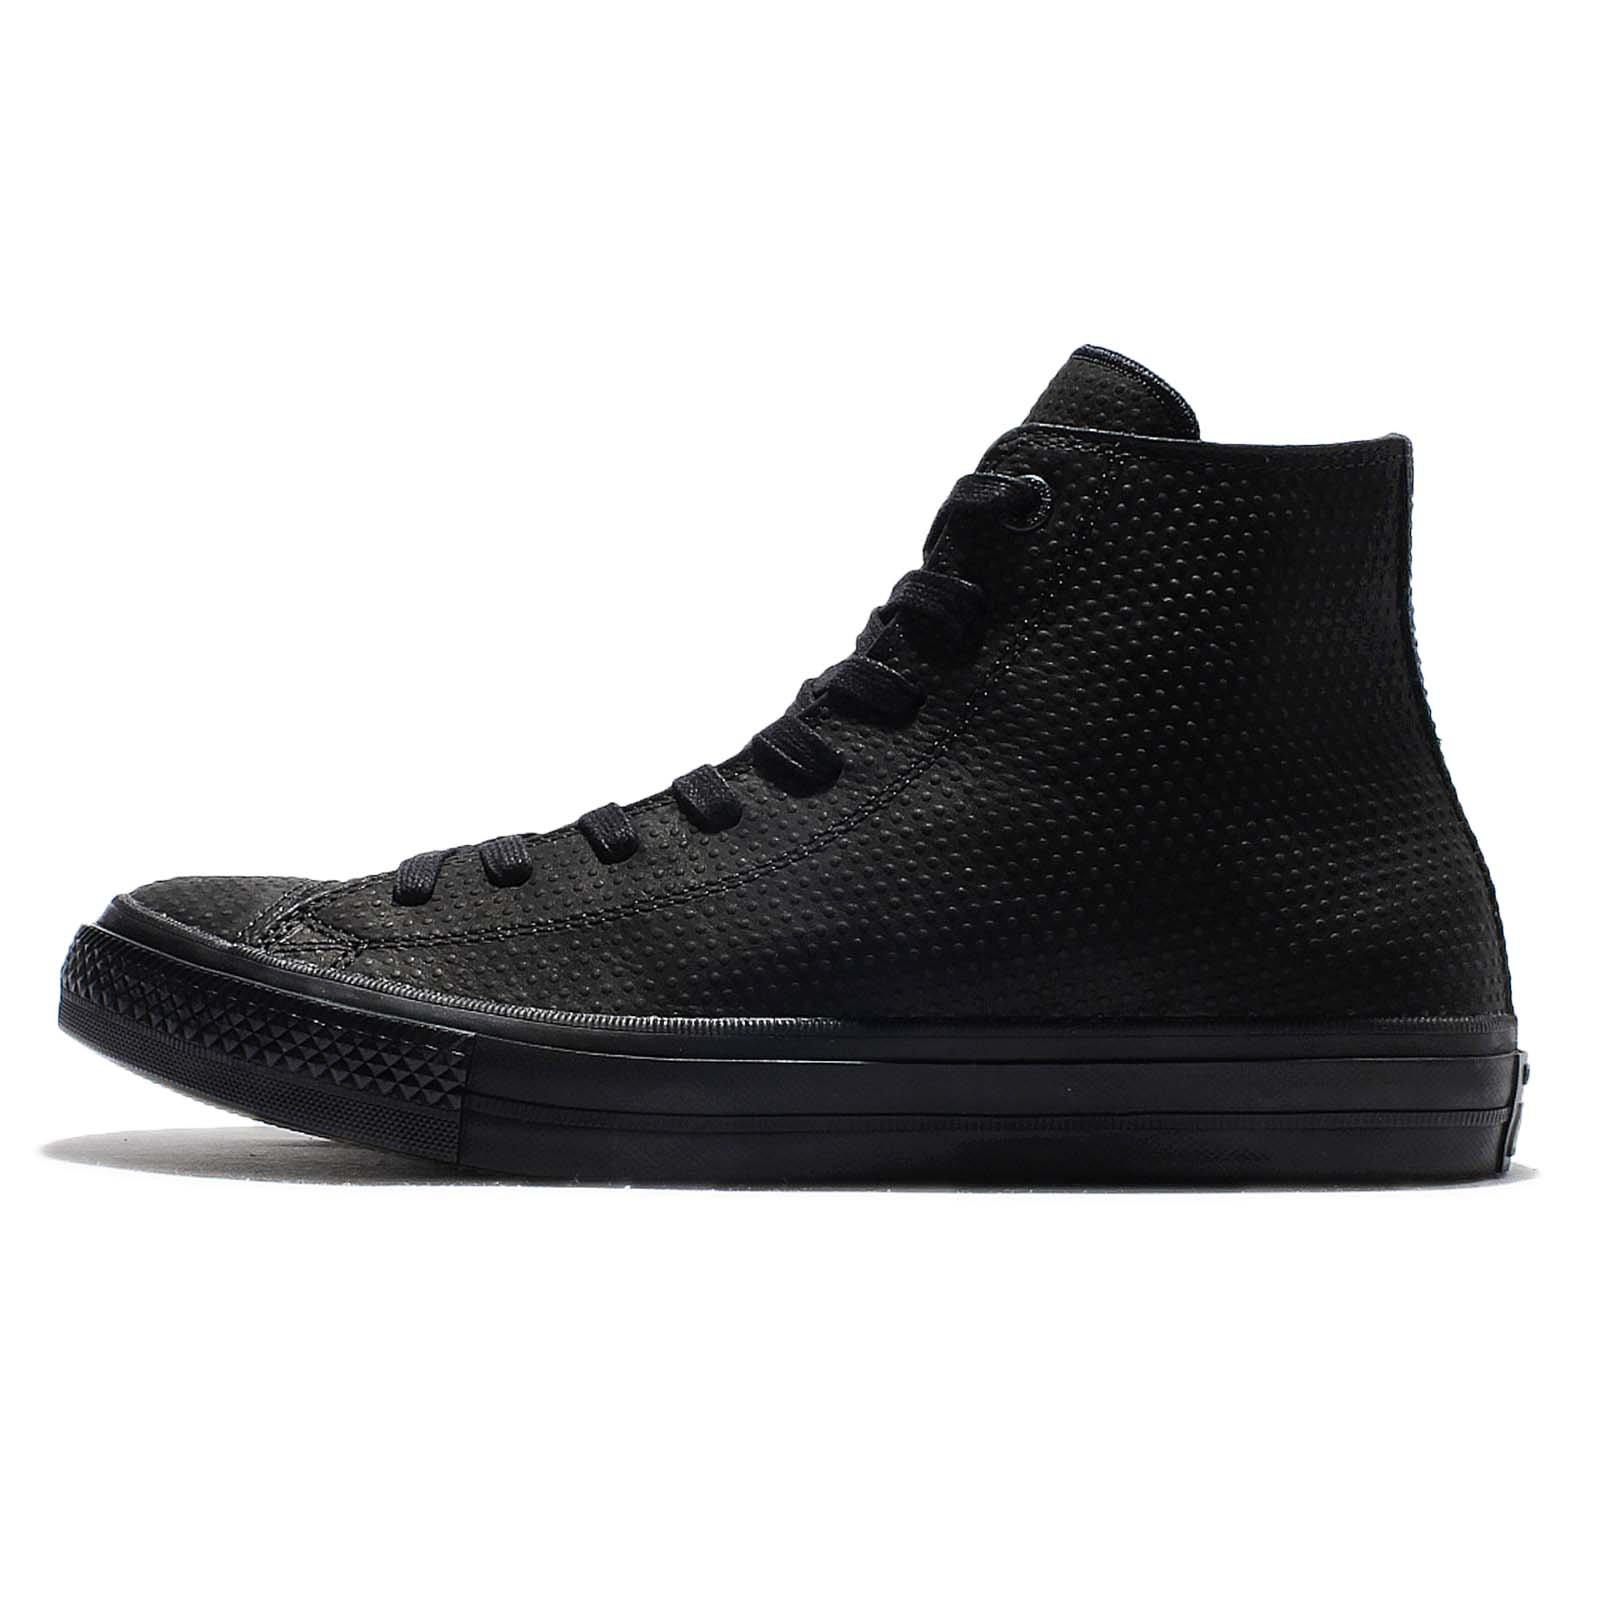 Converse Unisex Chuck Taylor All Star II Hi Top Sneaker Black/Black/Gum 9.5 D(M) US